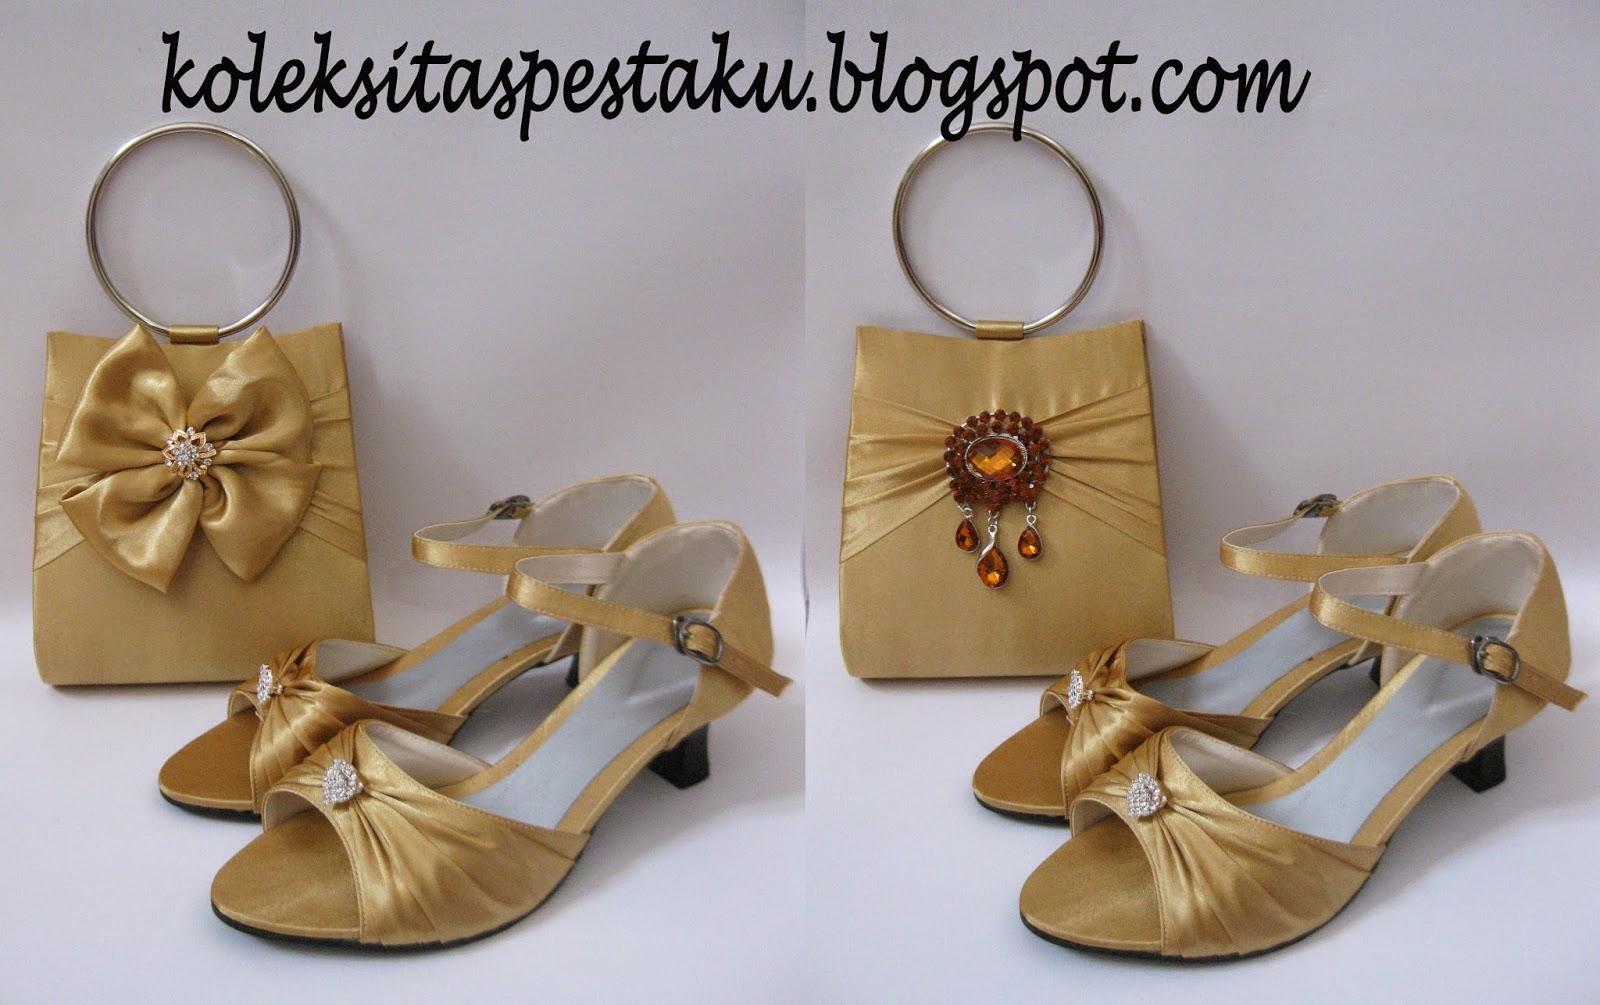 Gold Cantik dan Matching Tas Pesta Sepatu